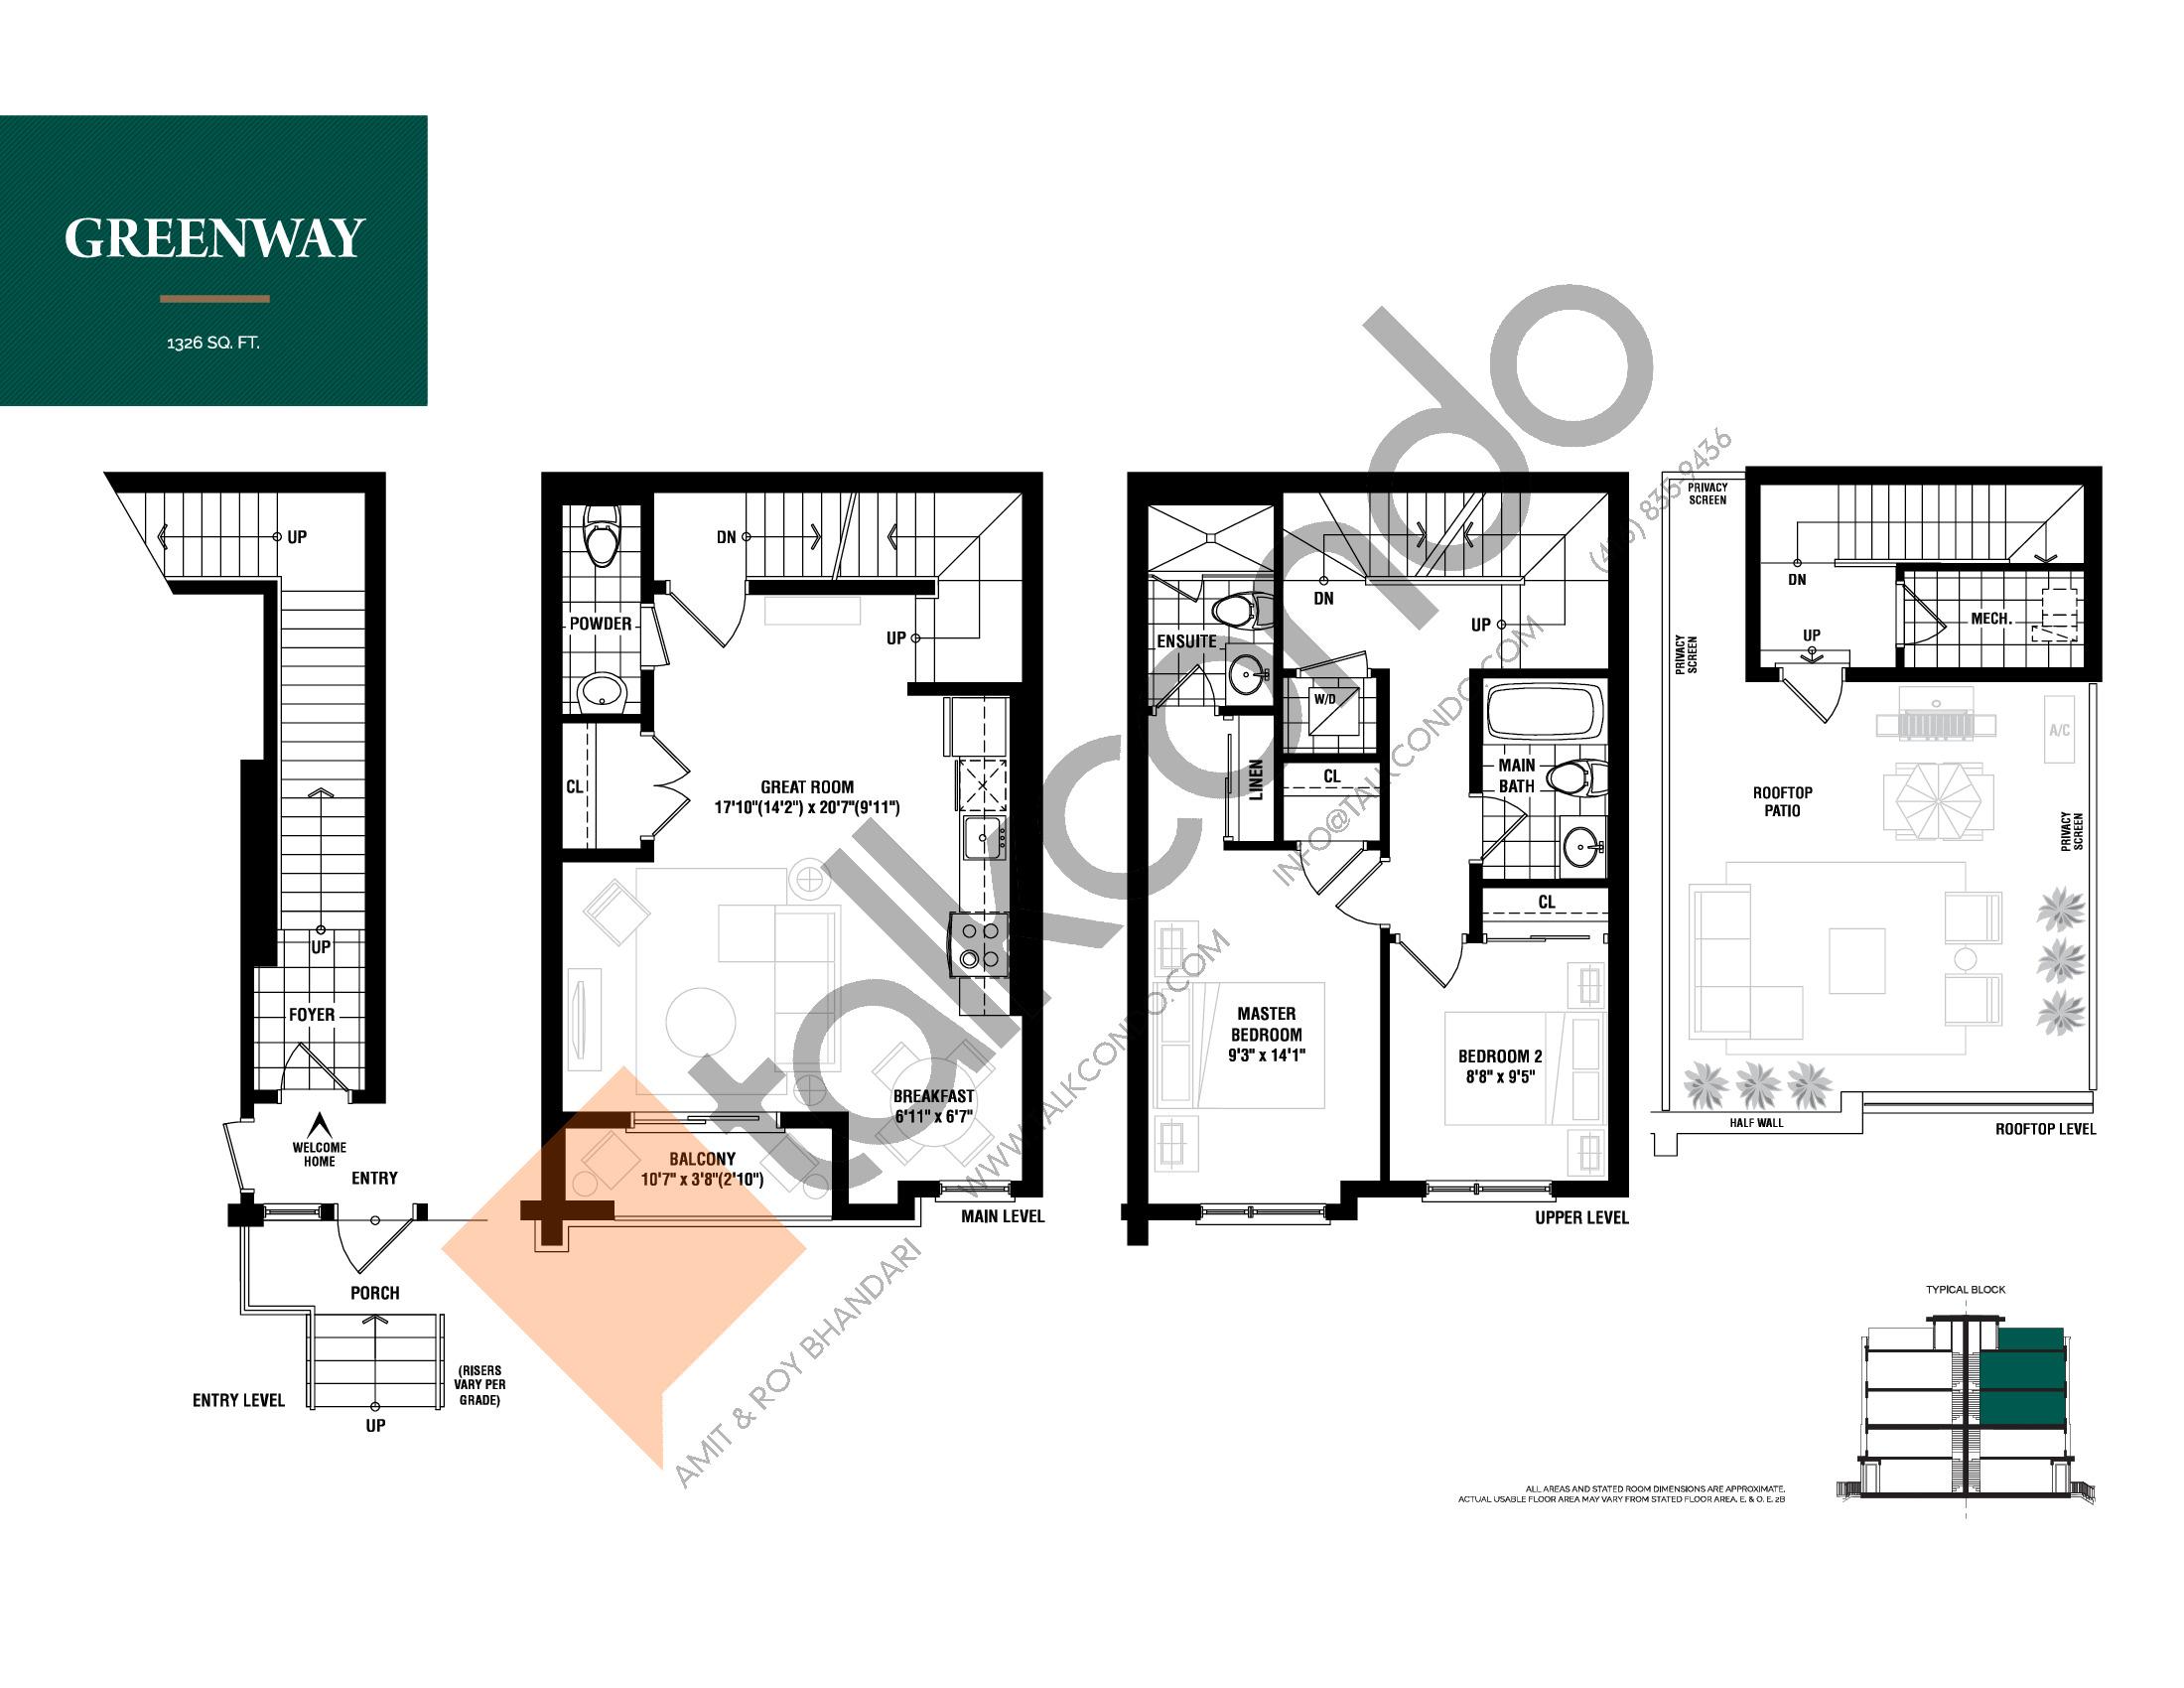 Greenway Floor Plan at The Way Urban Towns - 1326 sq.ft